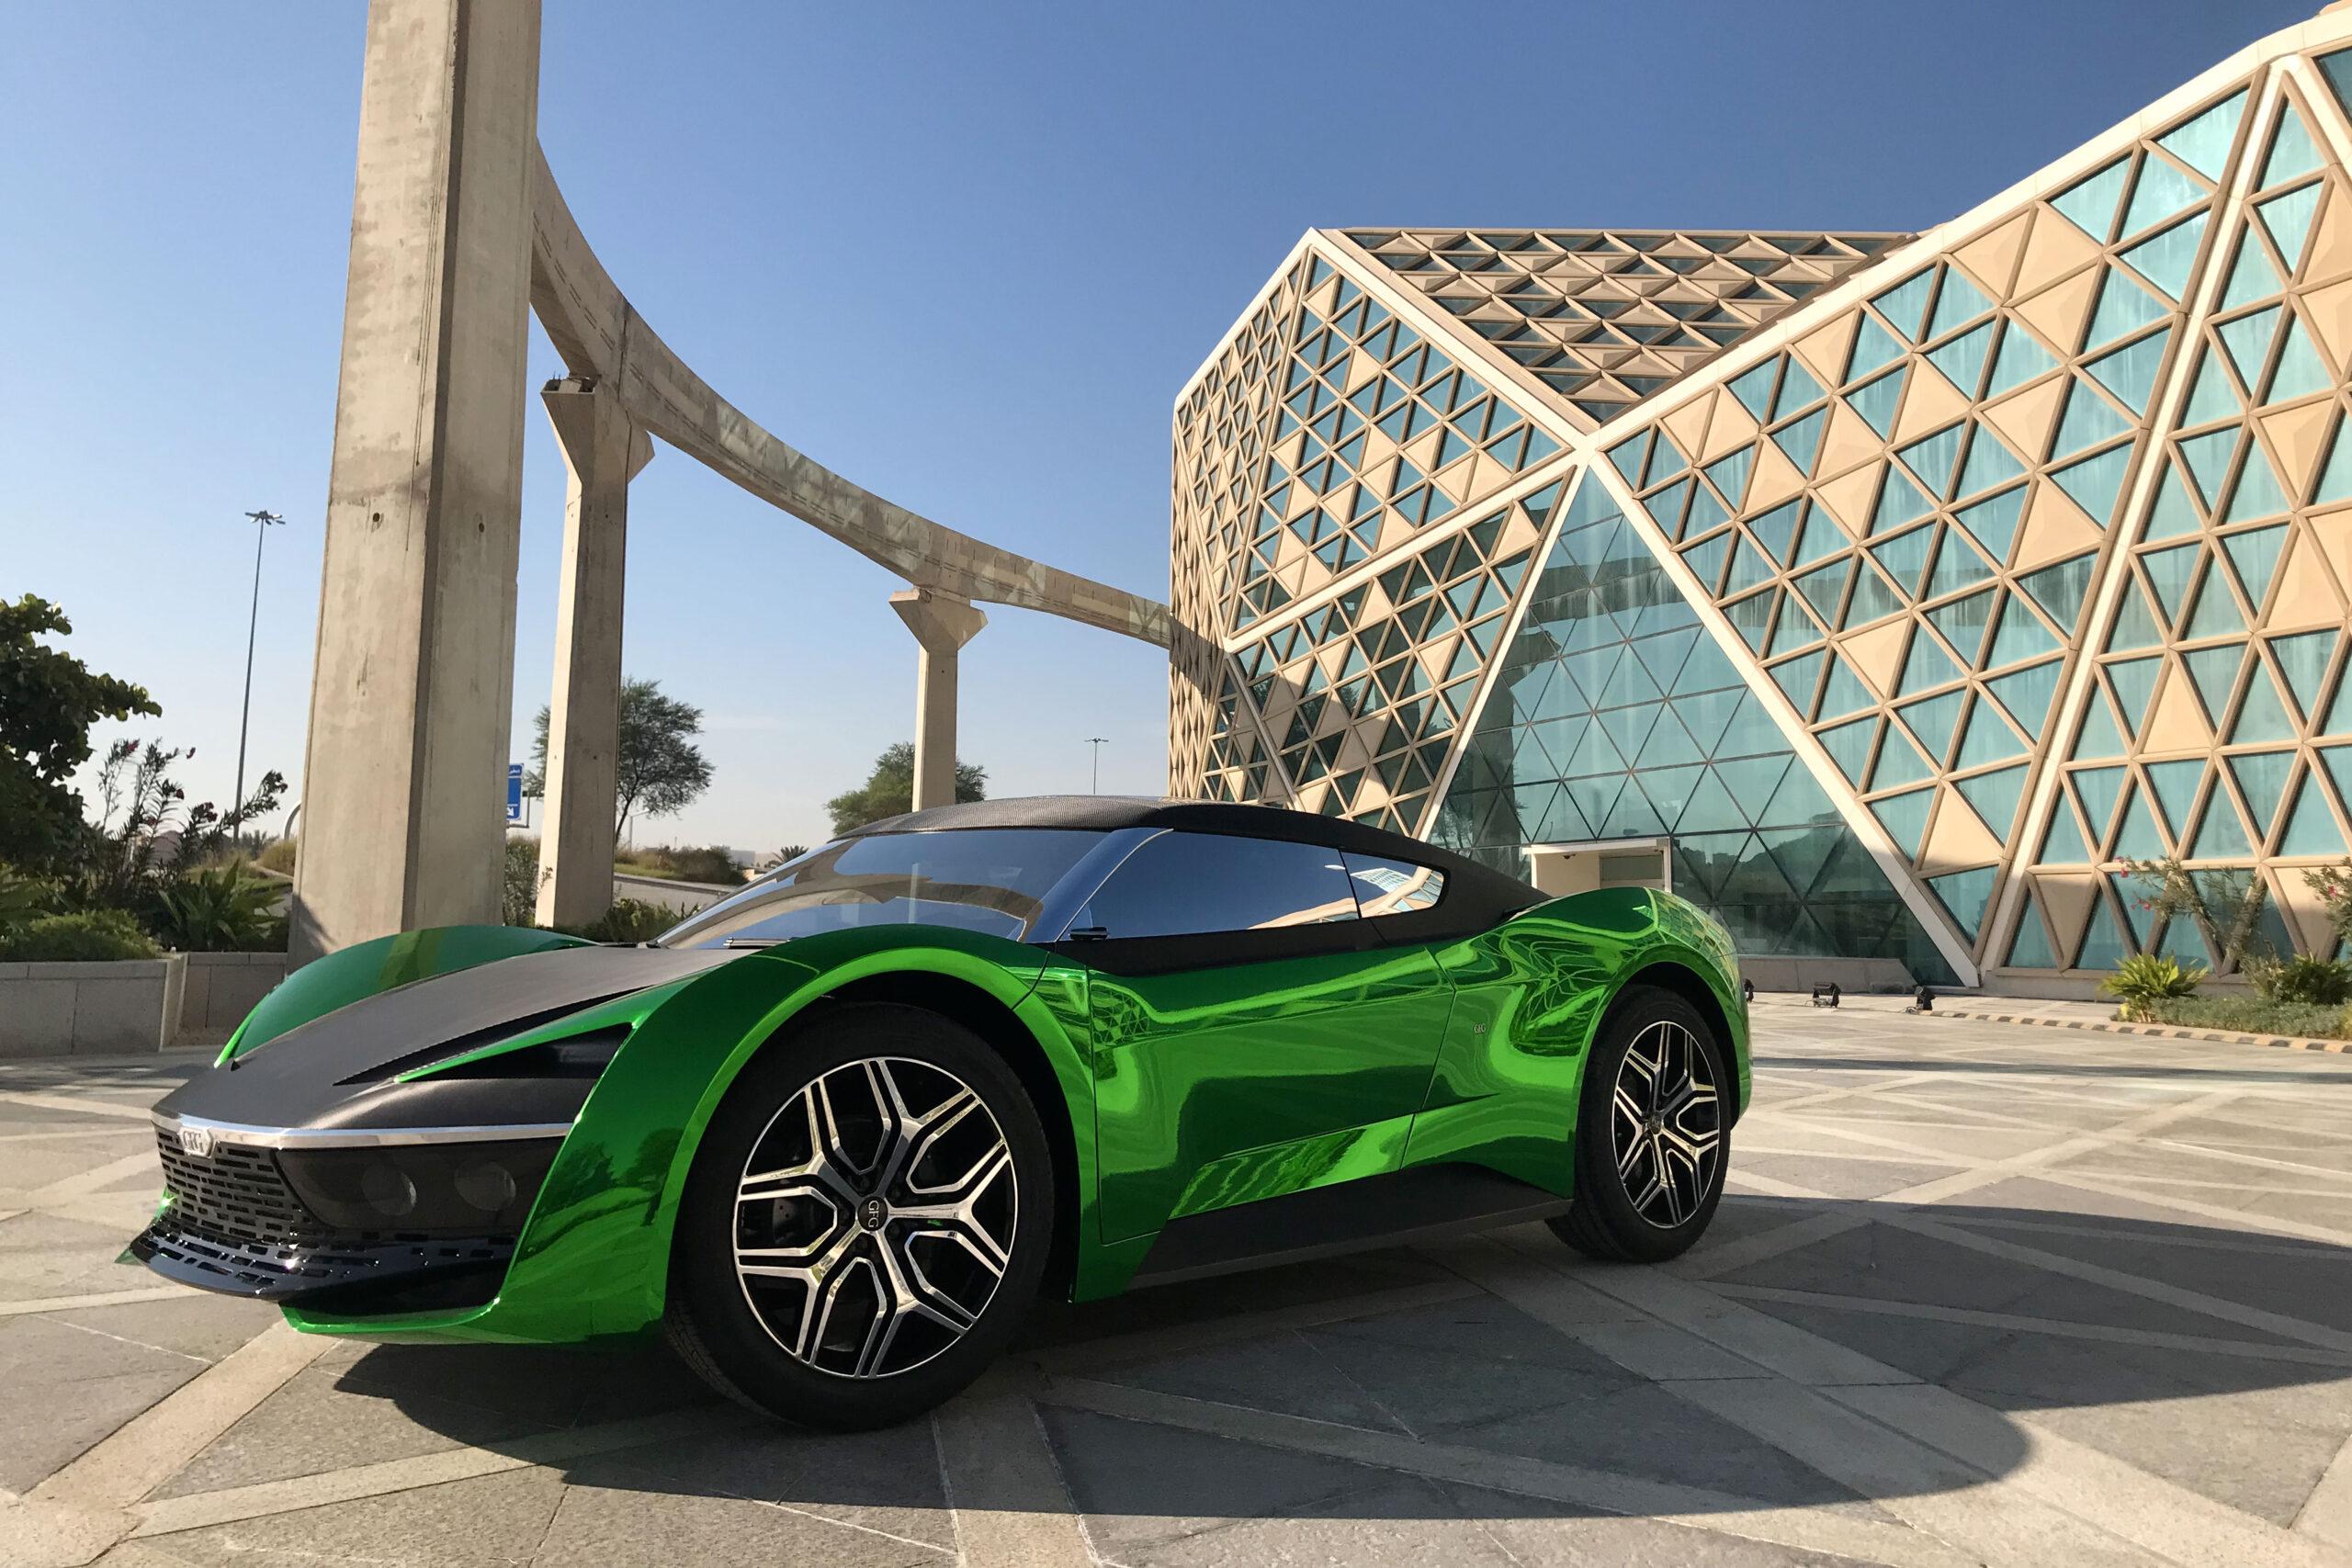 GFG Style 2030: from Riyadh to Geneva